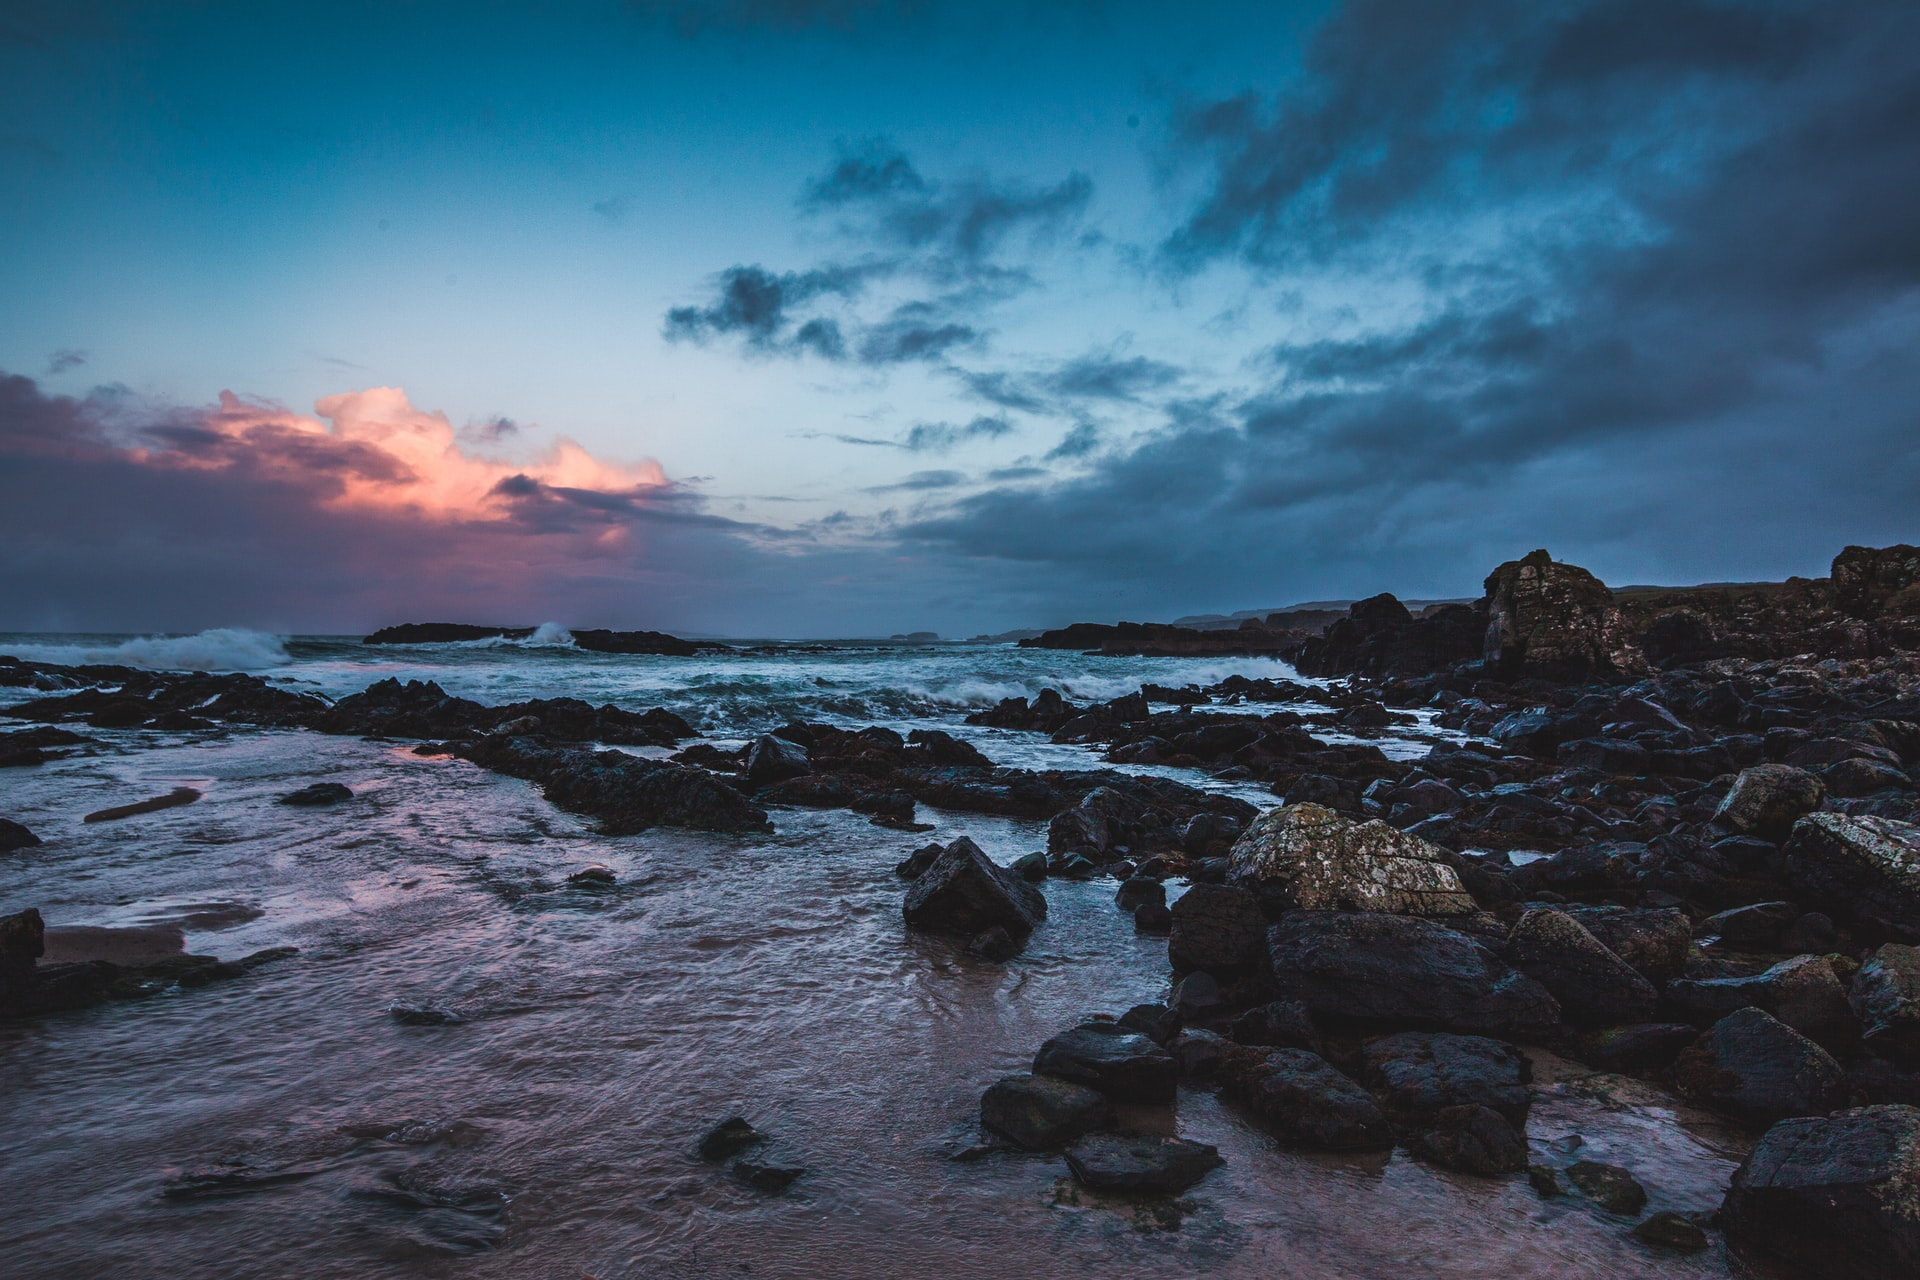 sunrise over a rocky seashore